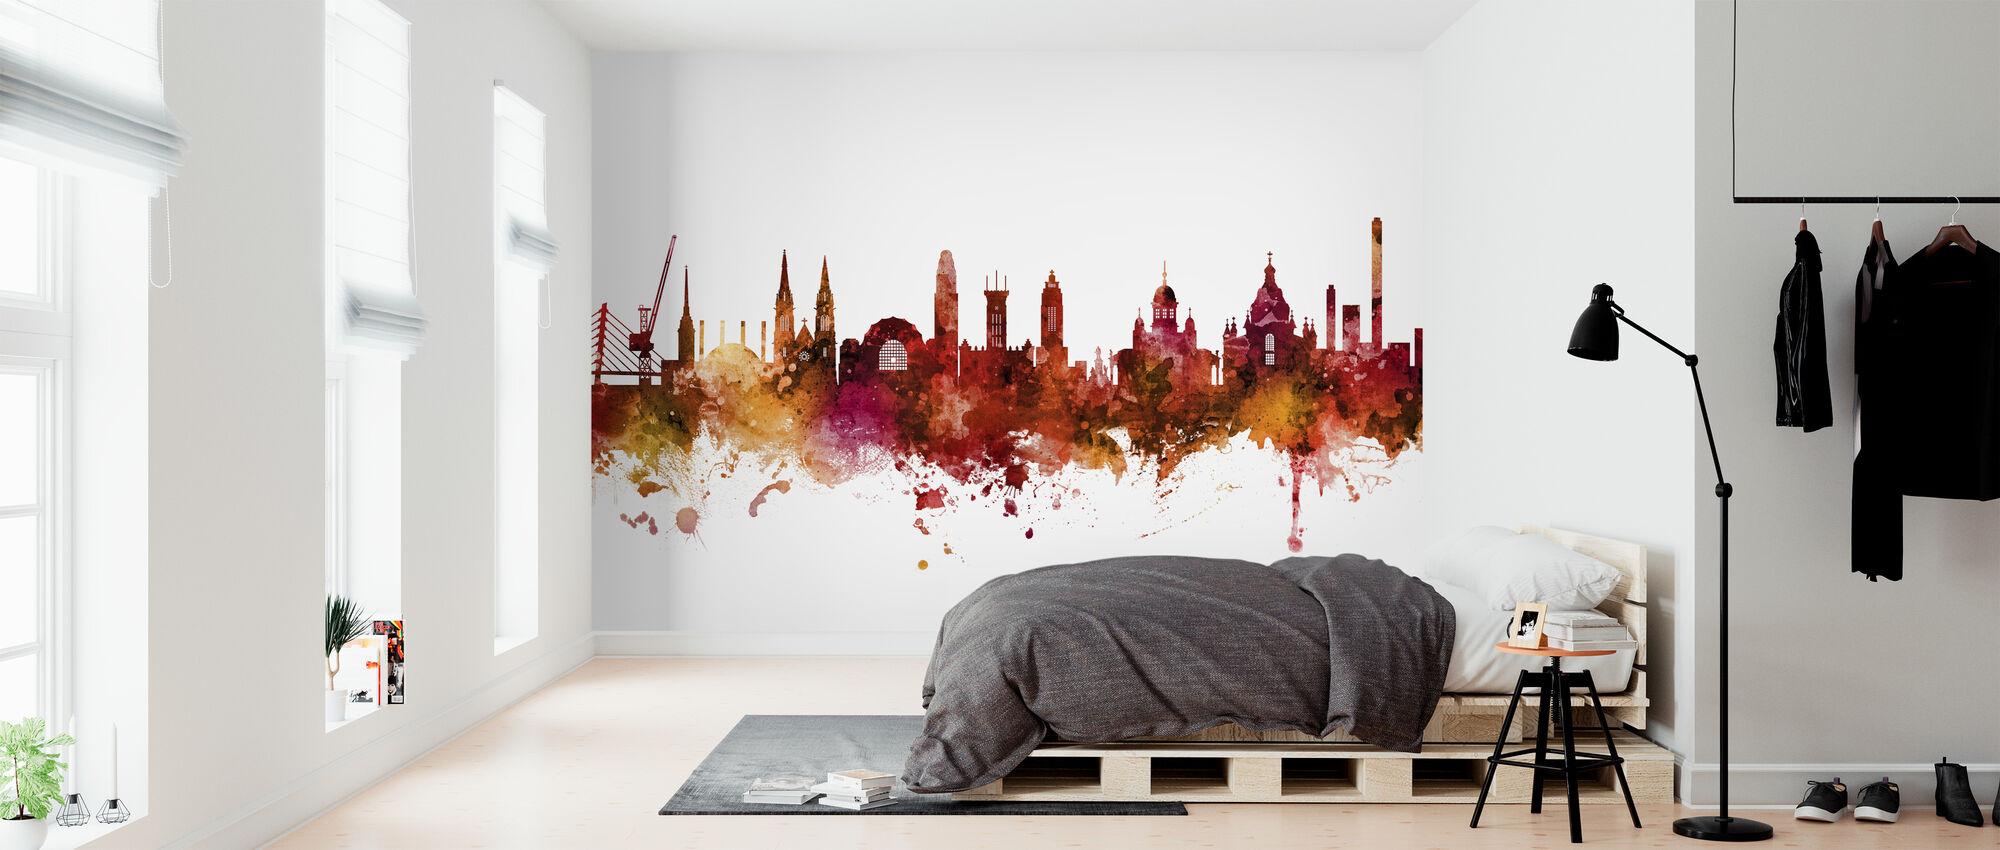 Helsinki Finland Skyline - Wallpaper - Bedroom